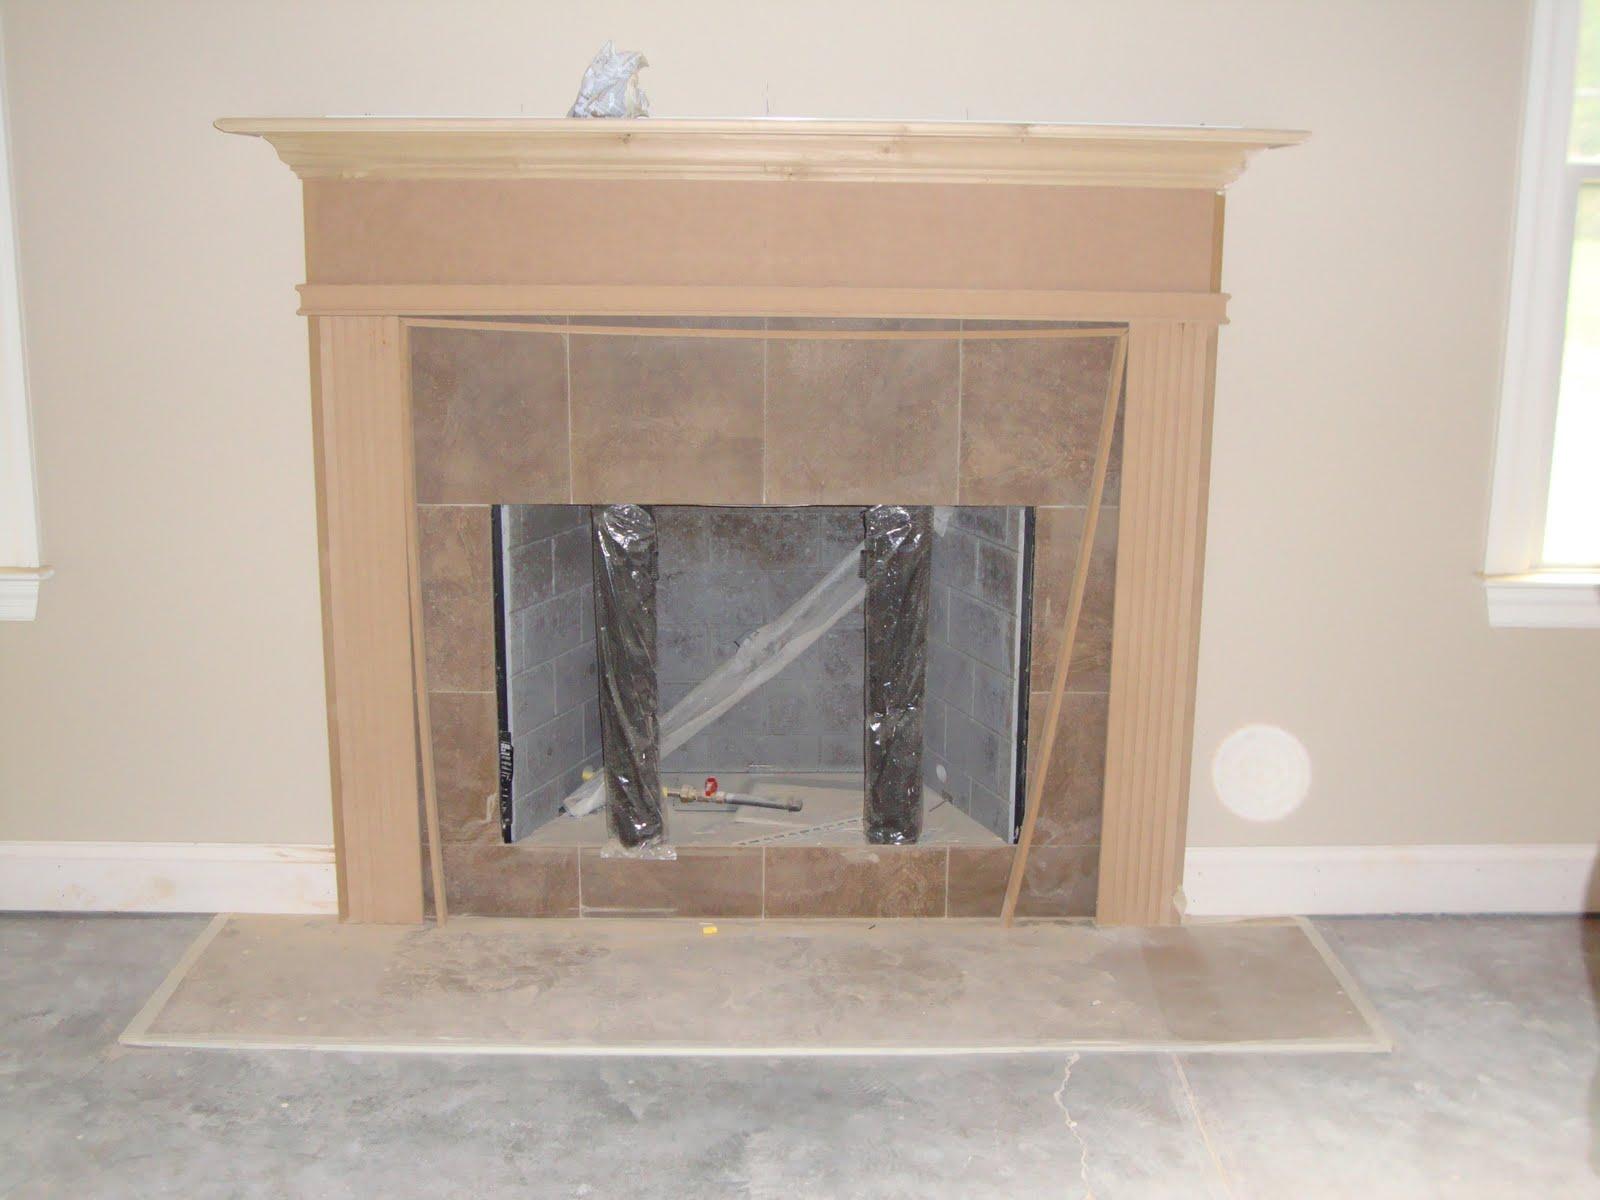 Home Building Project Backsplash Front Door Mantle And